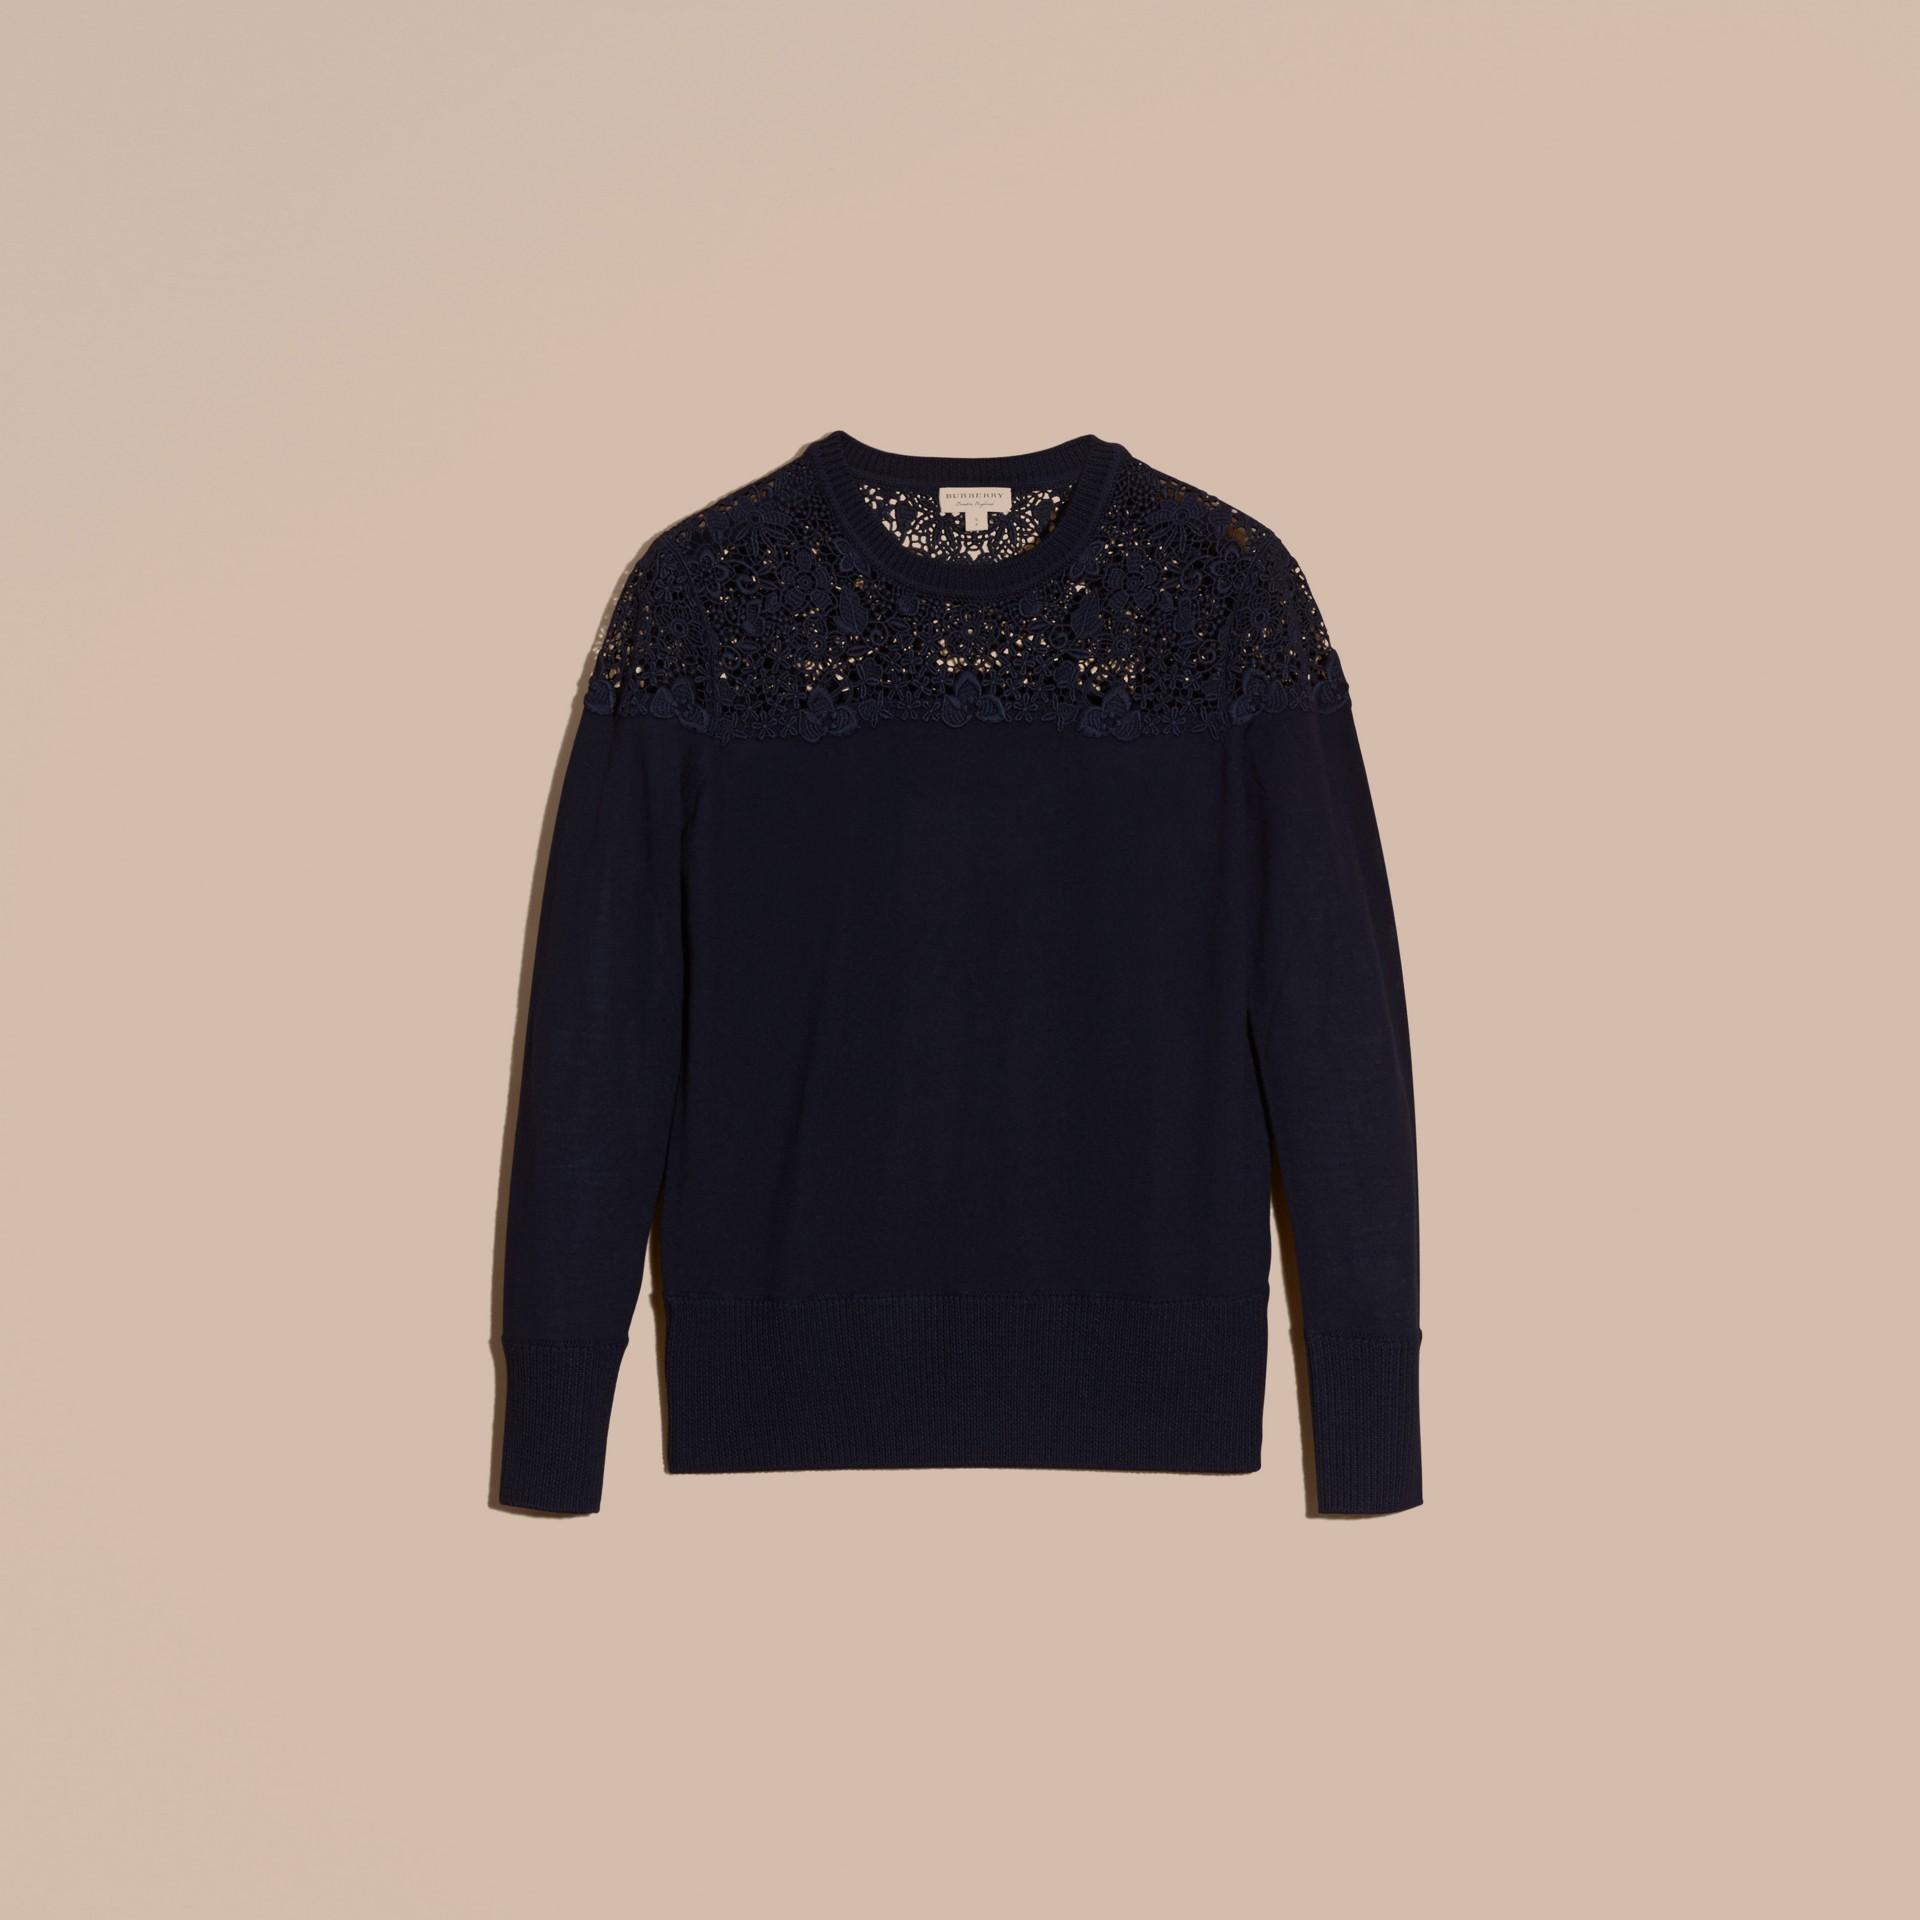 Navy Lace Yoke Merino Wool Sweater Navy - gallery image 4